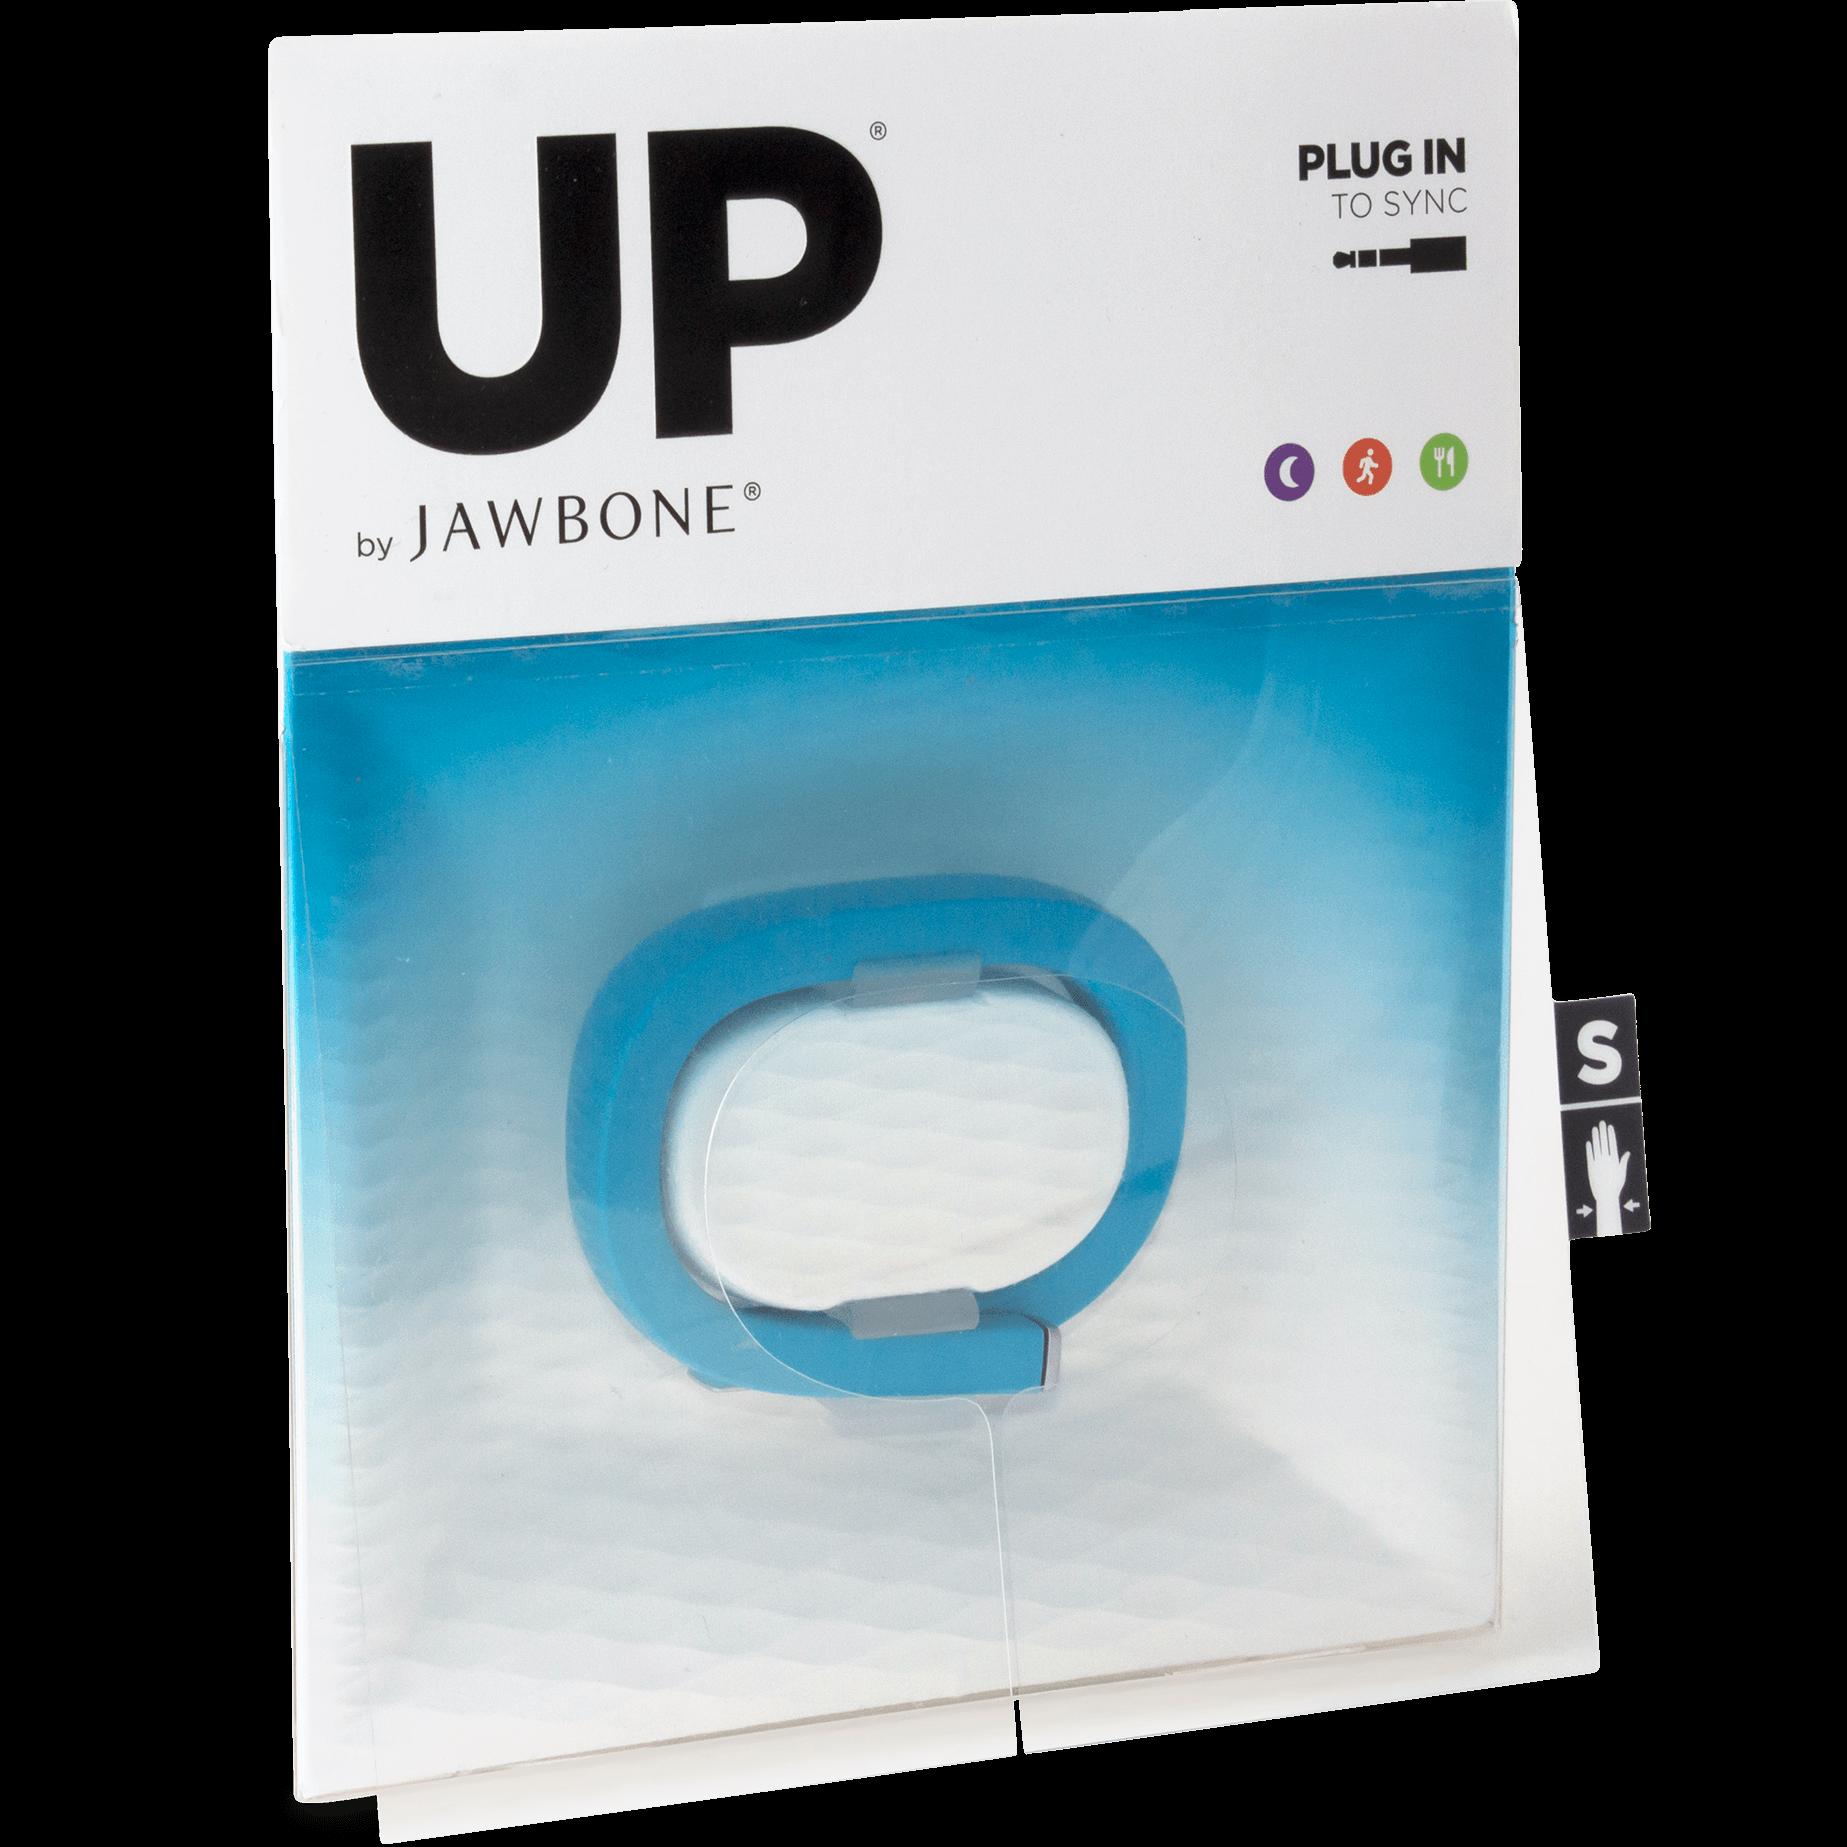 jawbone up 3 user manual 2017 2018 cars reviews. Black Bedroom Furniture Sets. Home Design Ideas